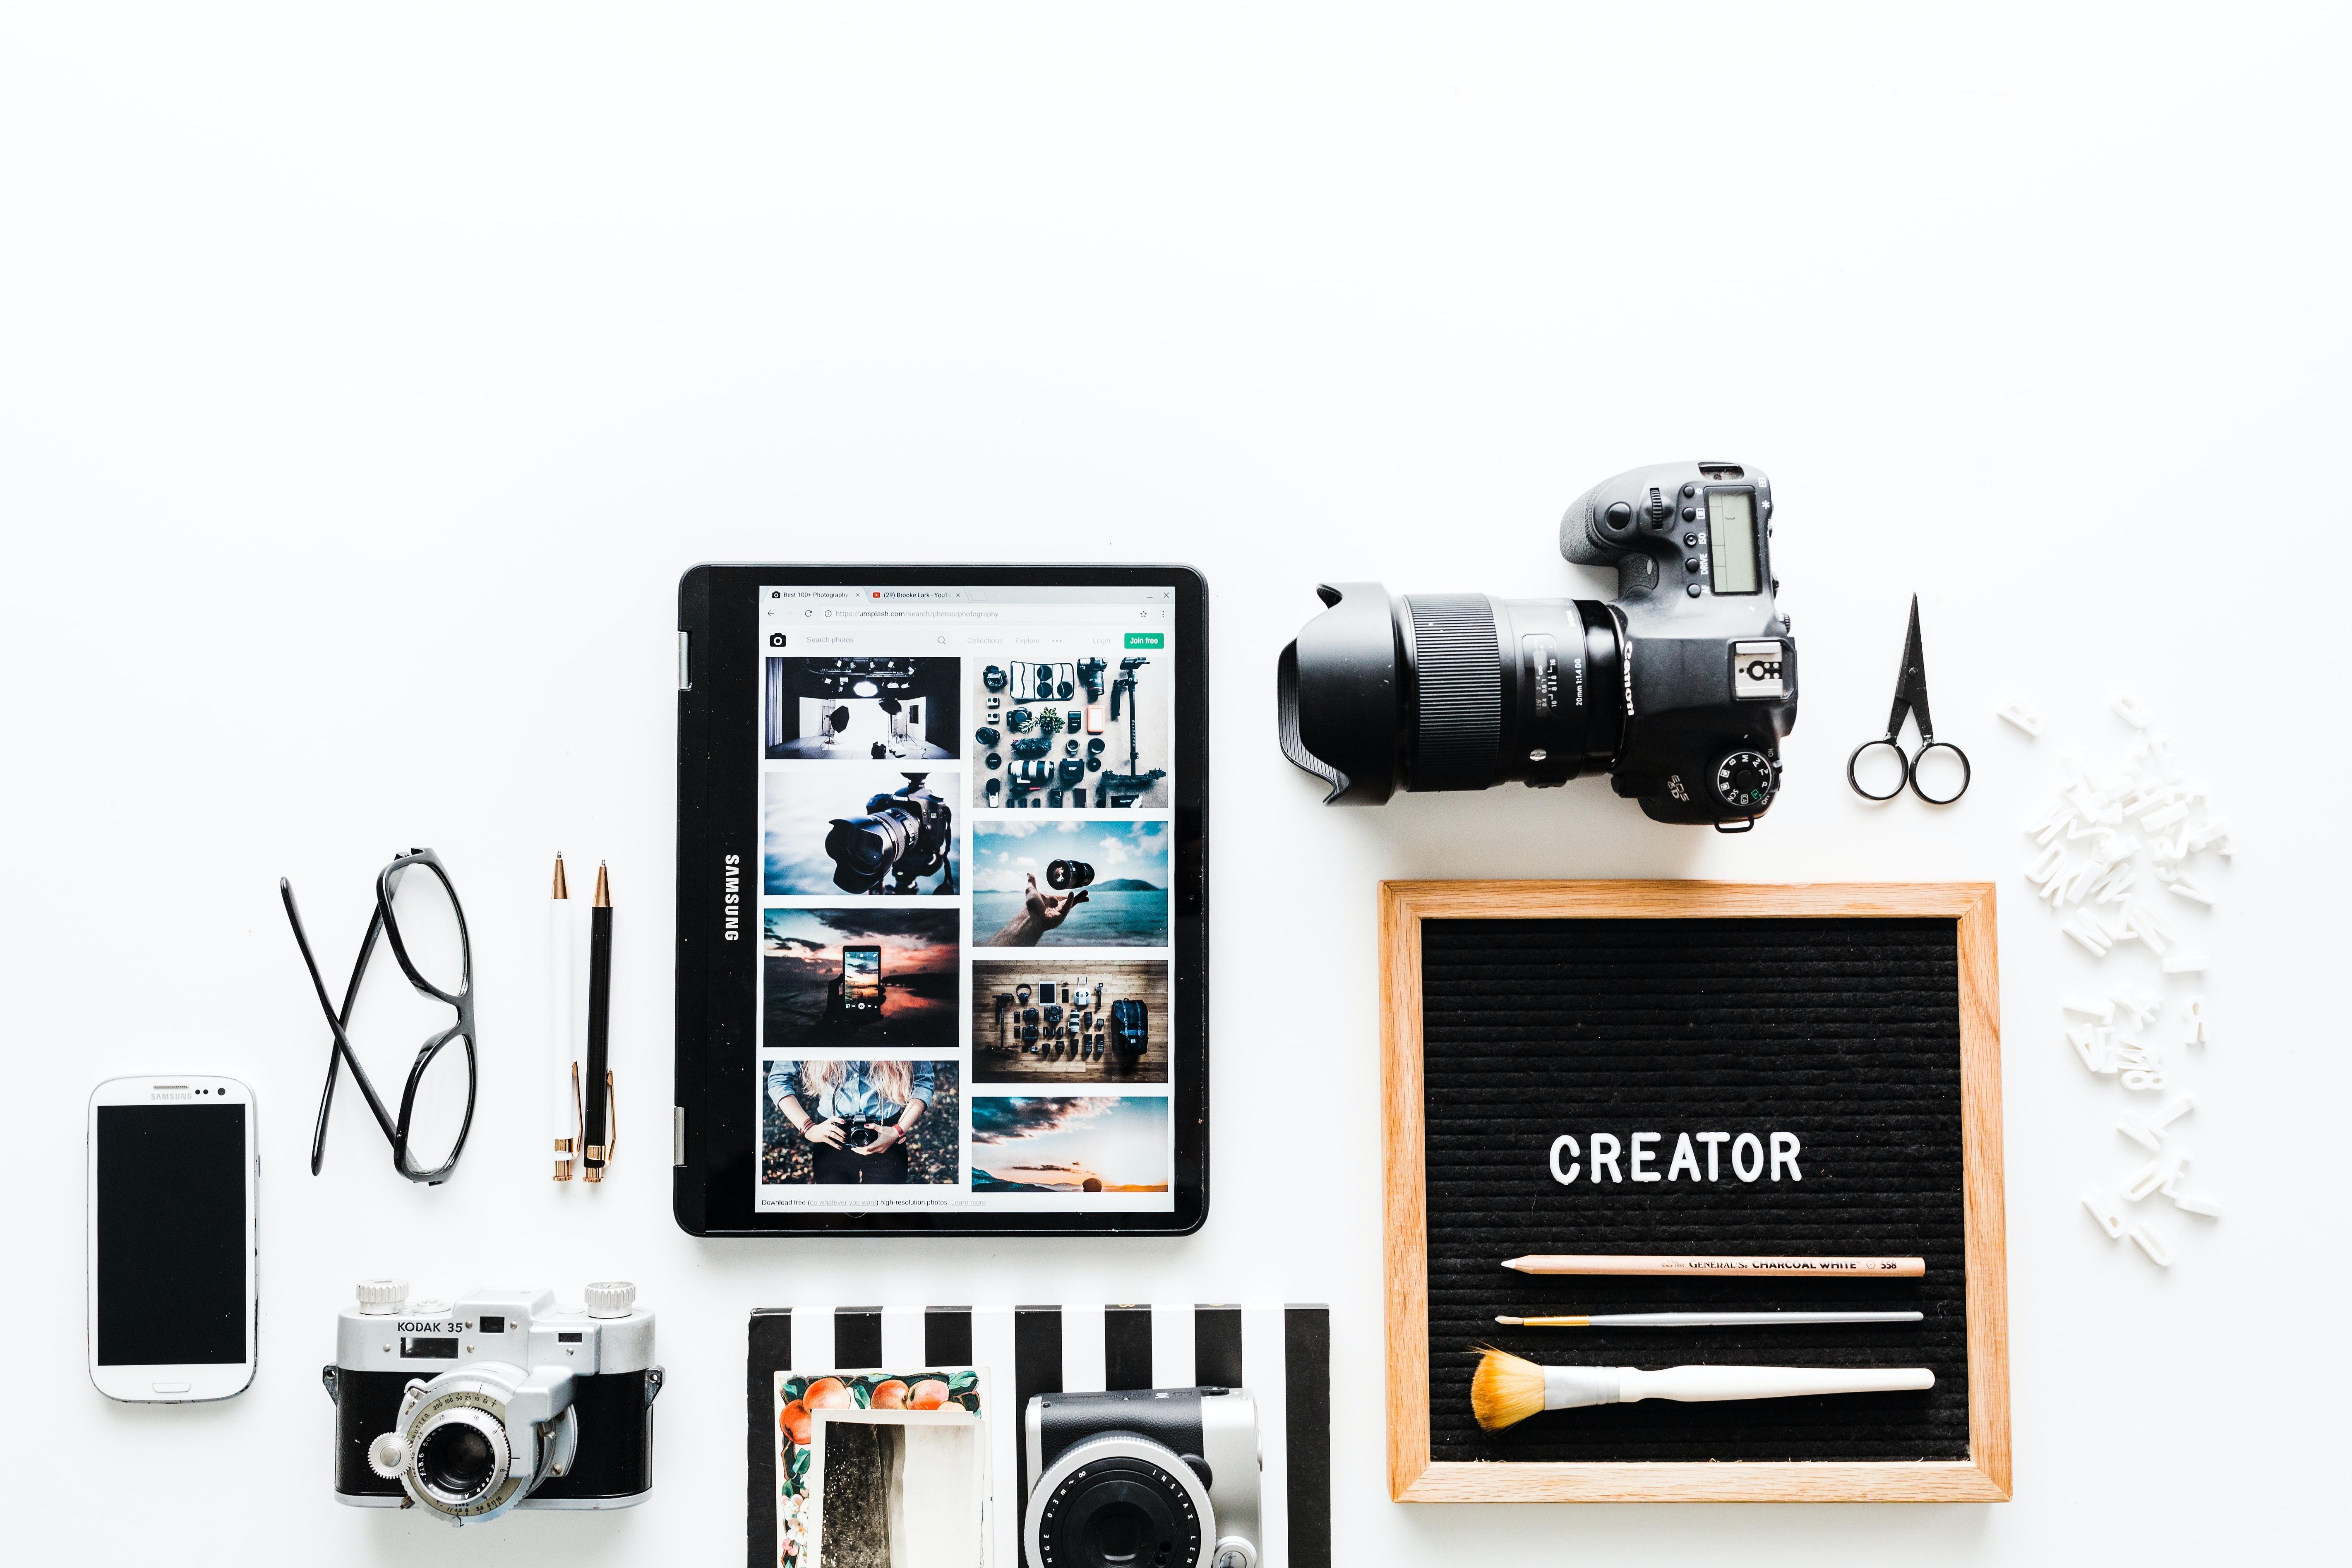 Video marketing materials